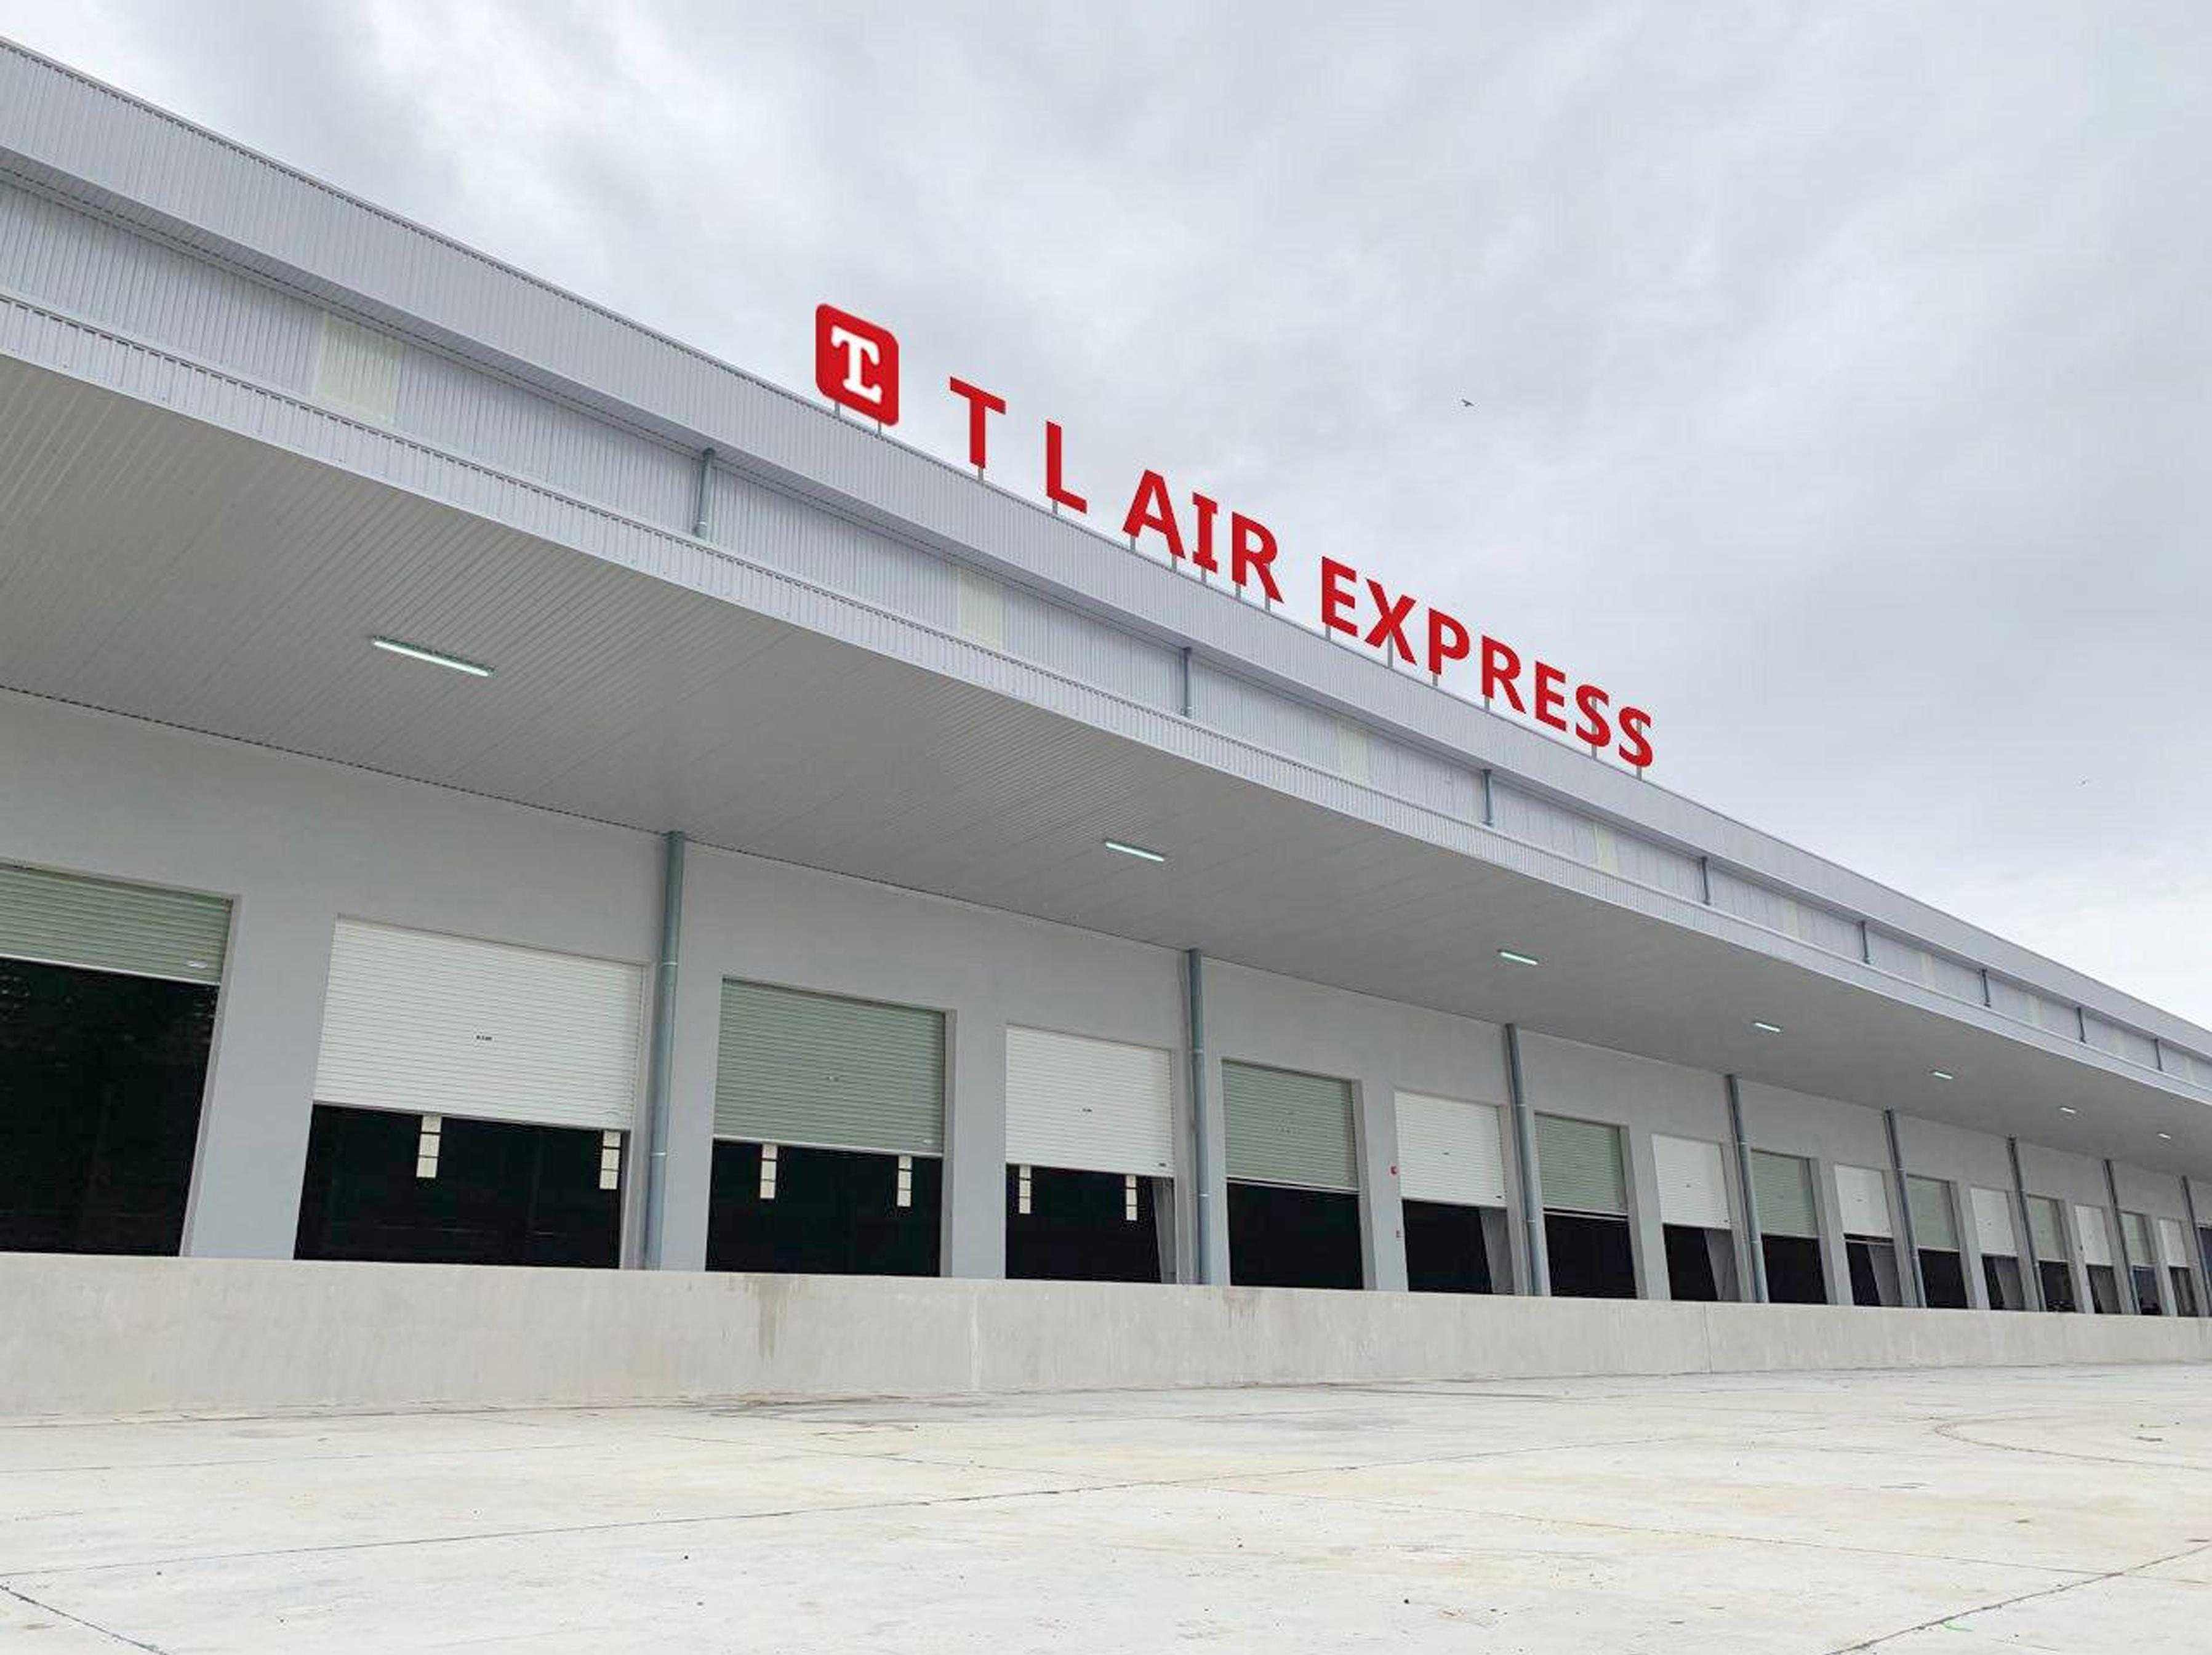 Tl Air Express